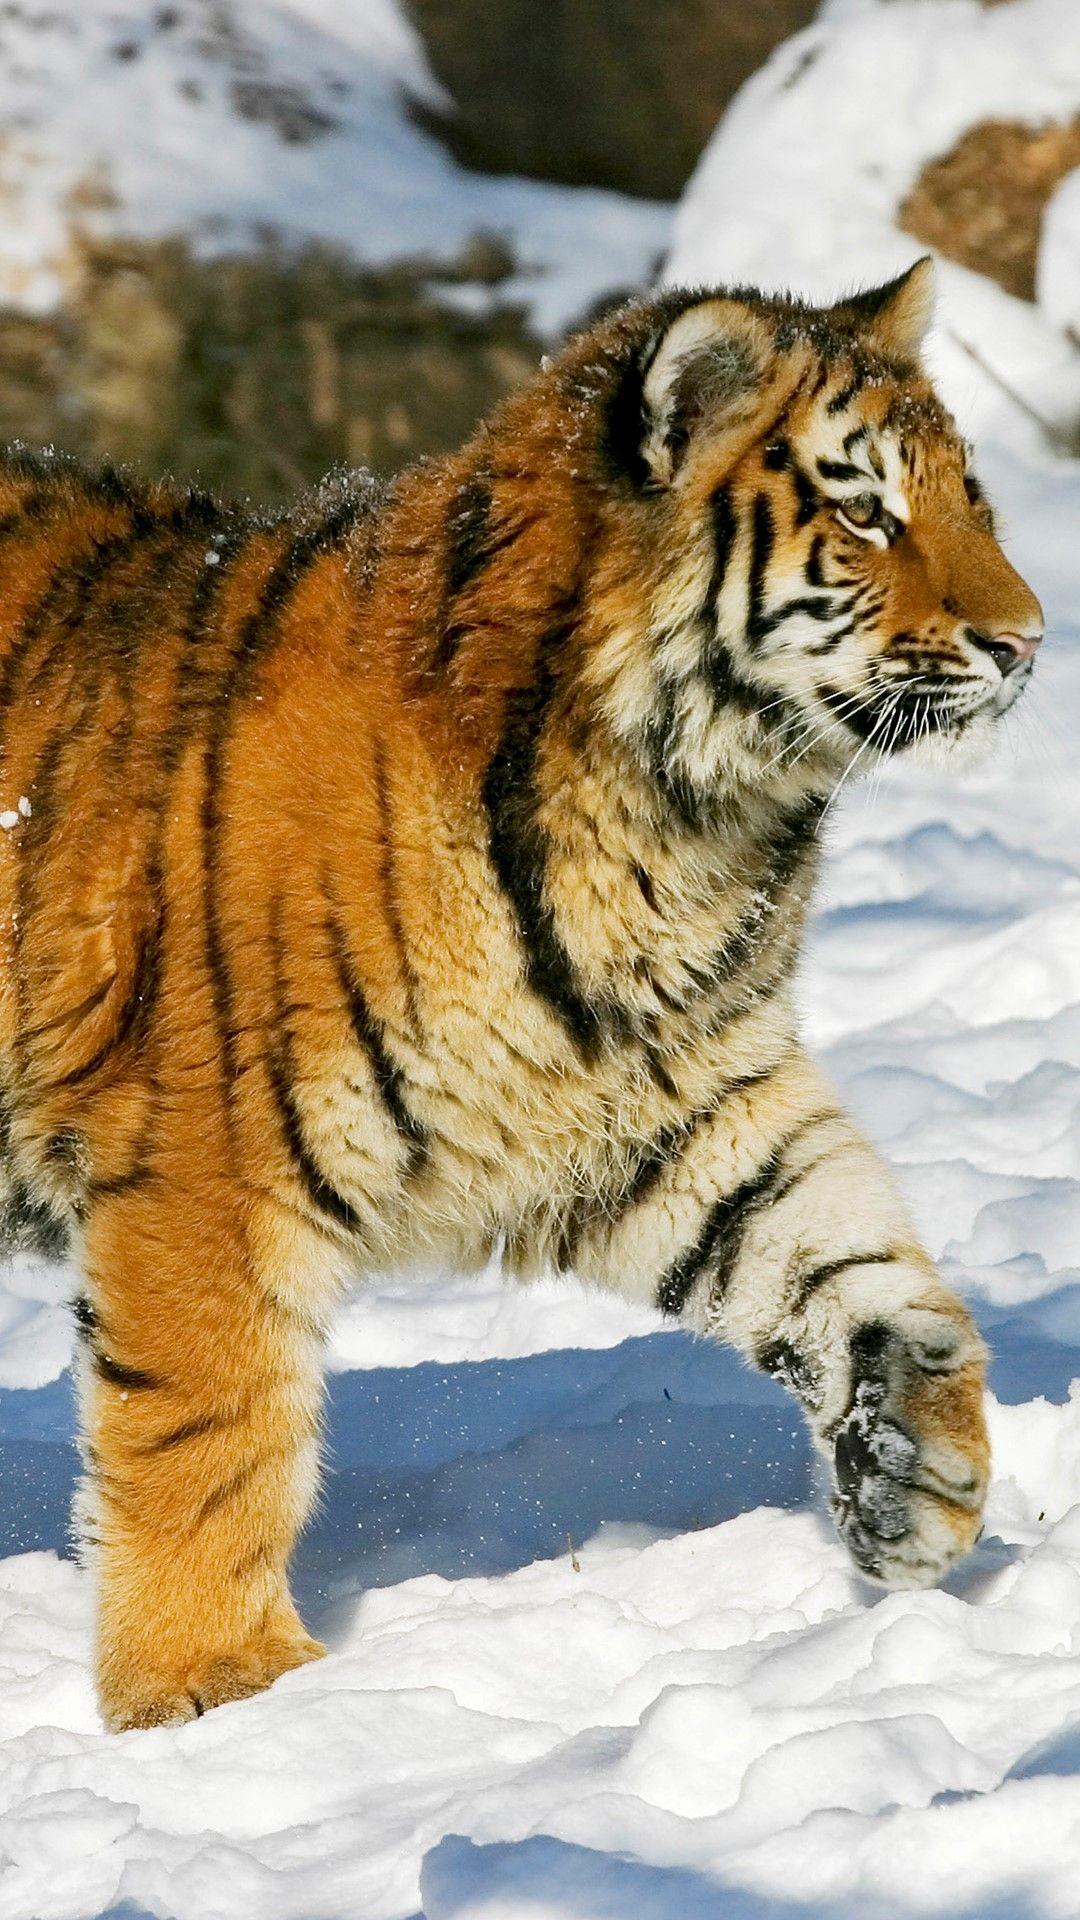 New Photo In Onedrive 8f3799e75650c46e281746e93dfd1f3612099a15f0487b81a663b4869f51a49f Jpg Panthera Tigris Panthera Animals